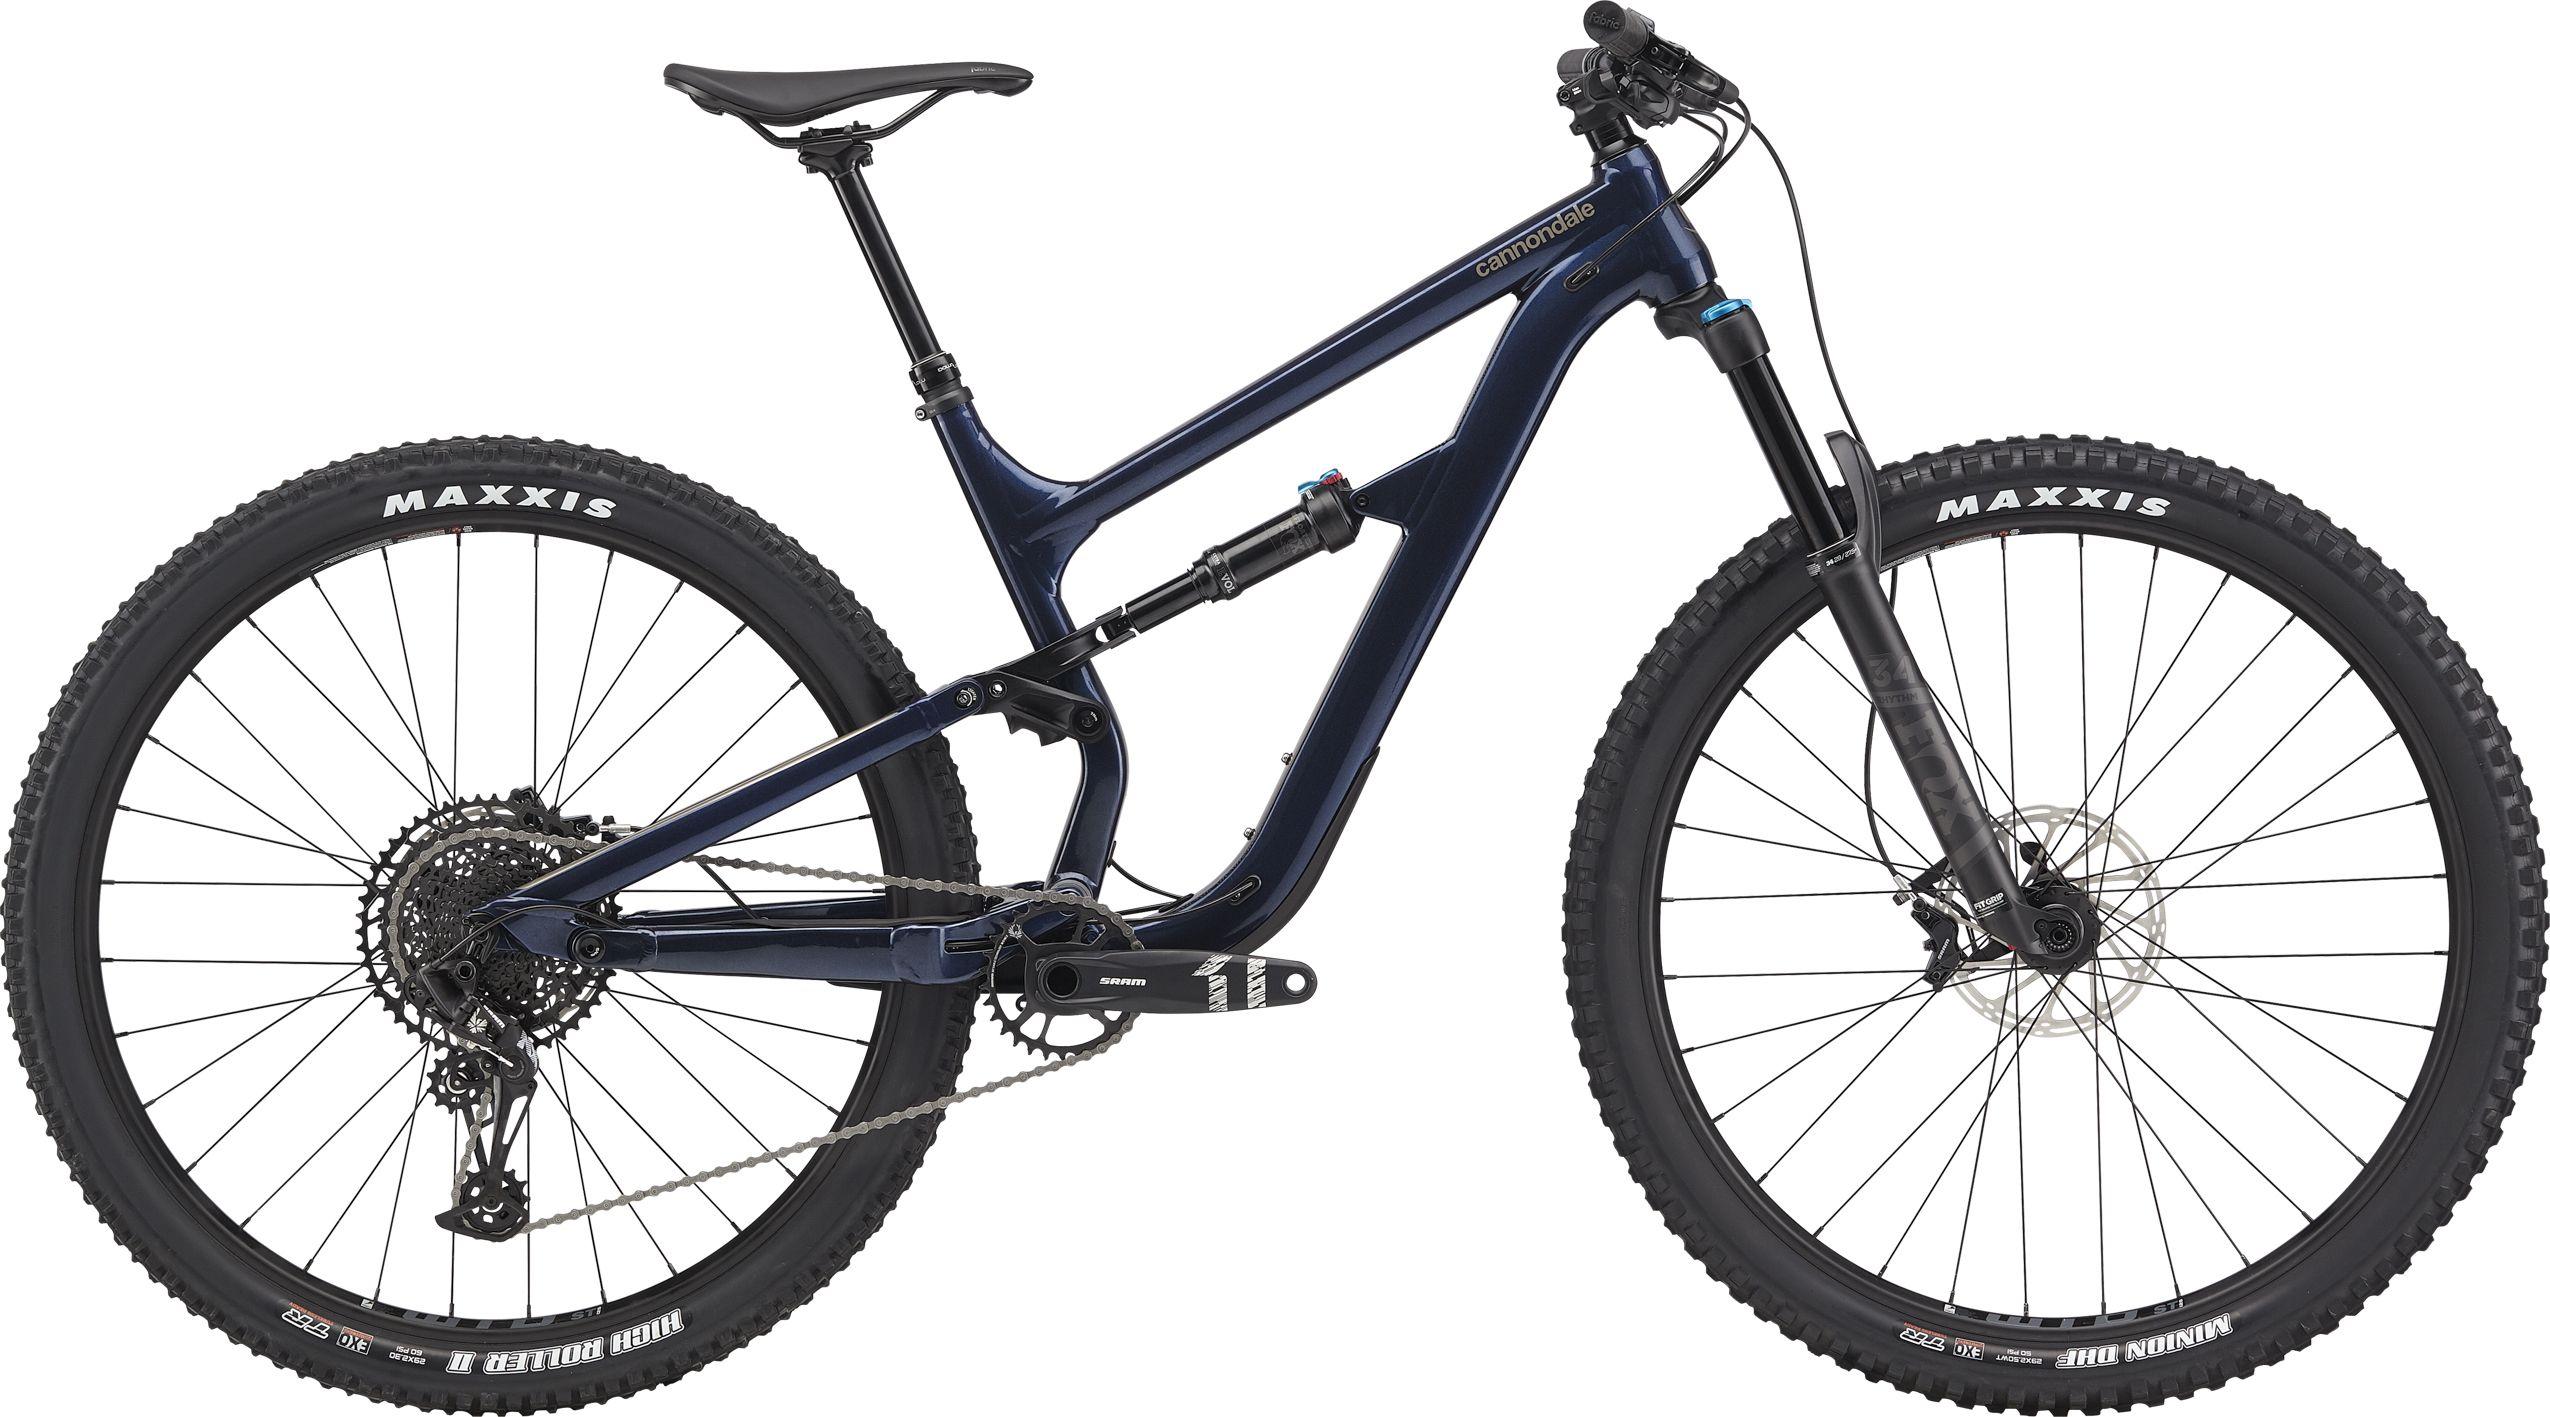 Cannondale Habit 4 29er Mountain Bike 2020 | Mountainbikes